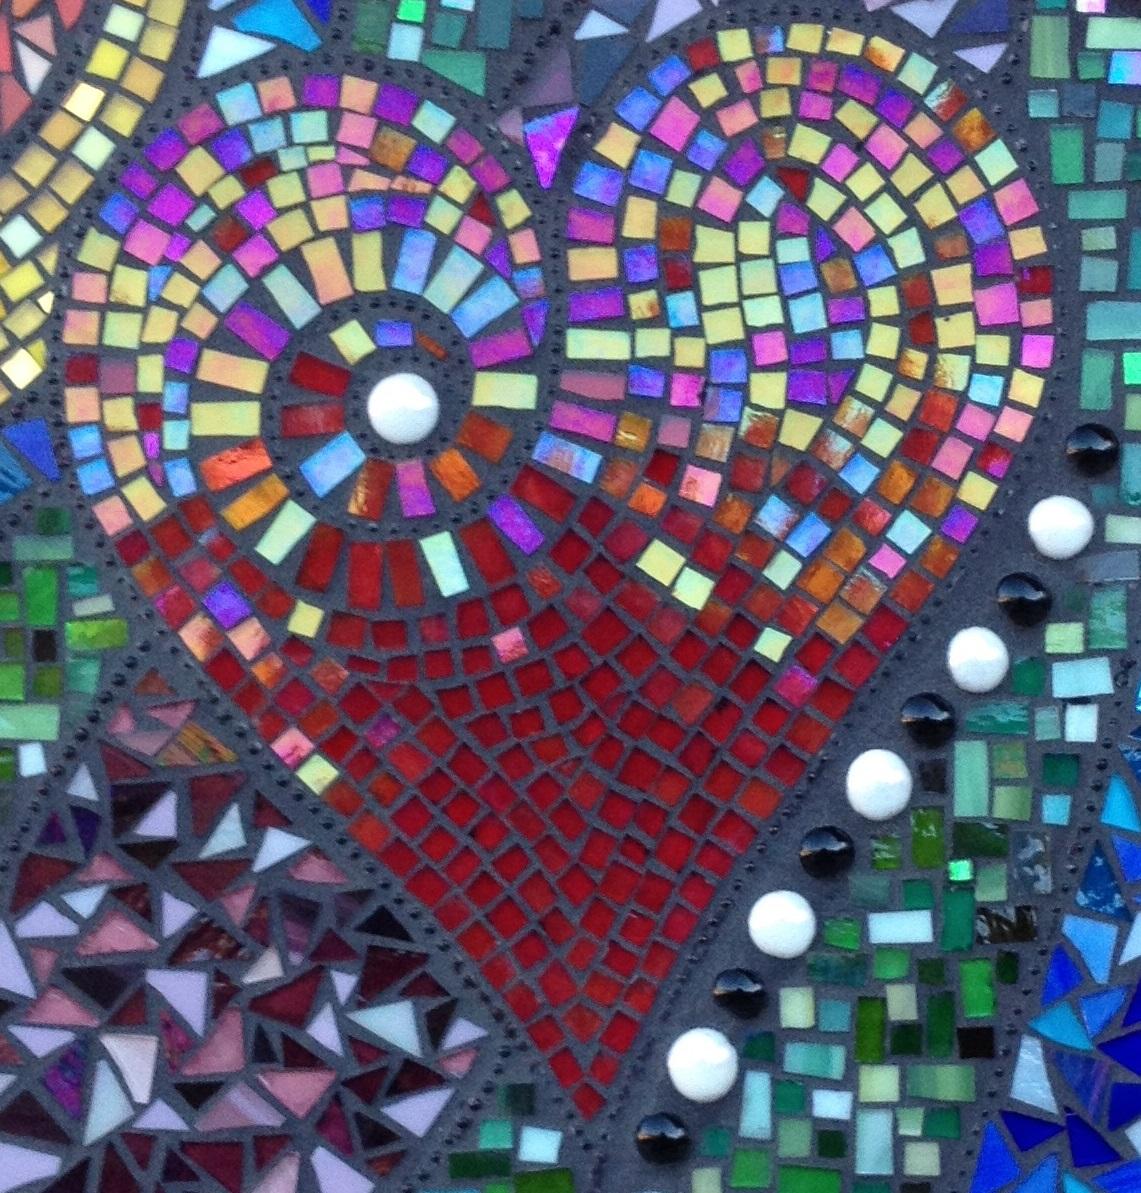 Free Online Mosaic Art Beginners Guide Mosaic Tile Mania